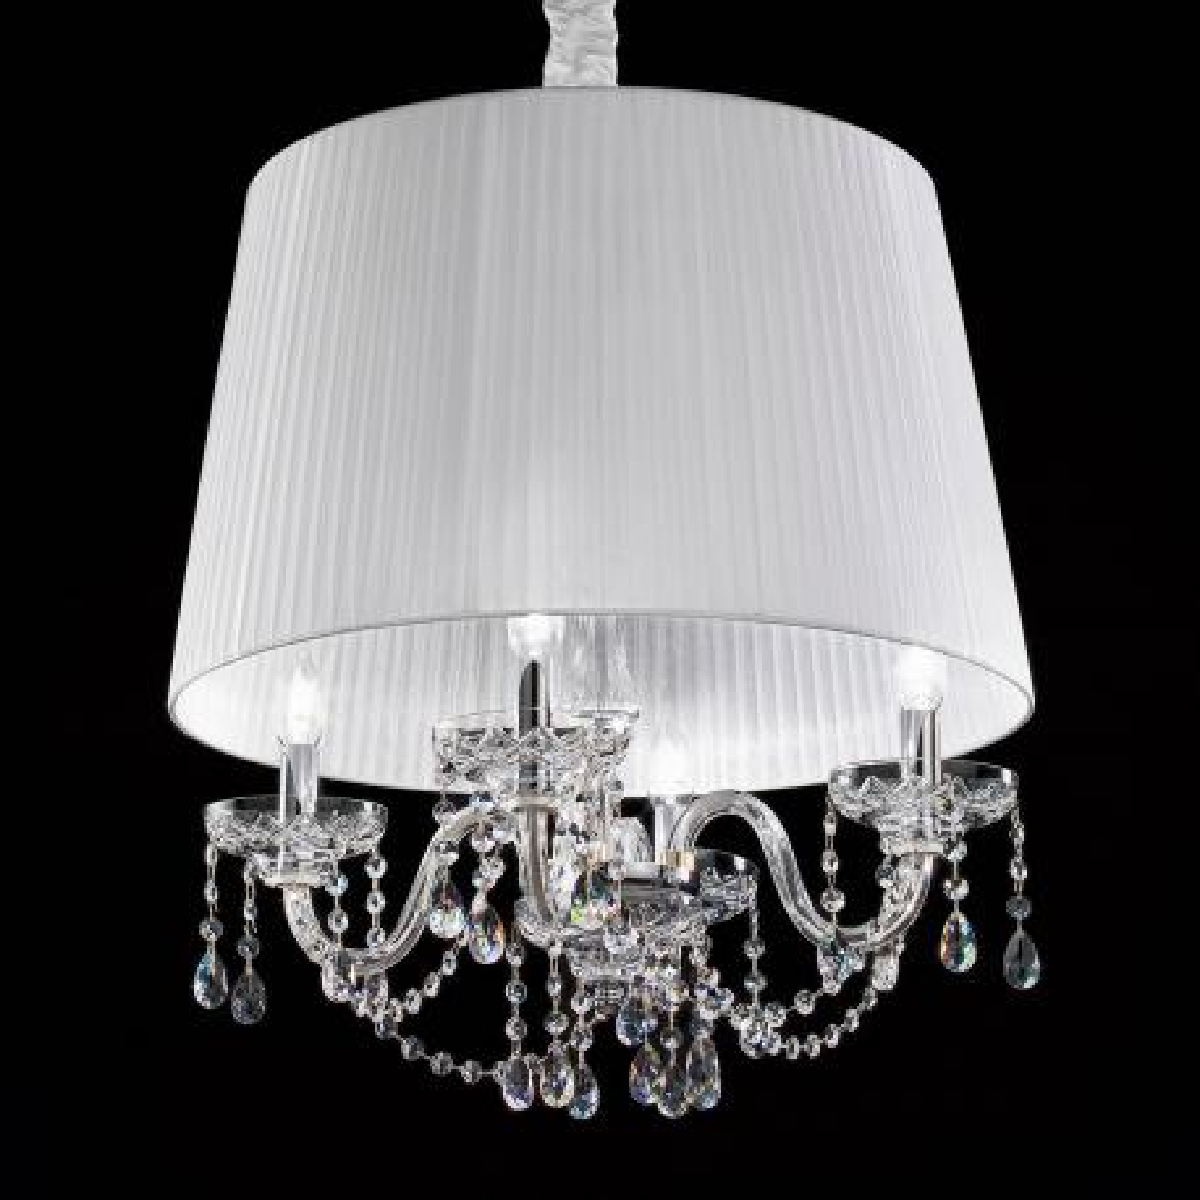 """Cimabue"" lámpara colgante veneciana en cristal  - 4 luces - transparente con transparent Asfour colgantes"